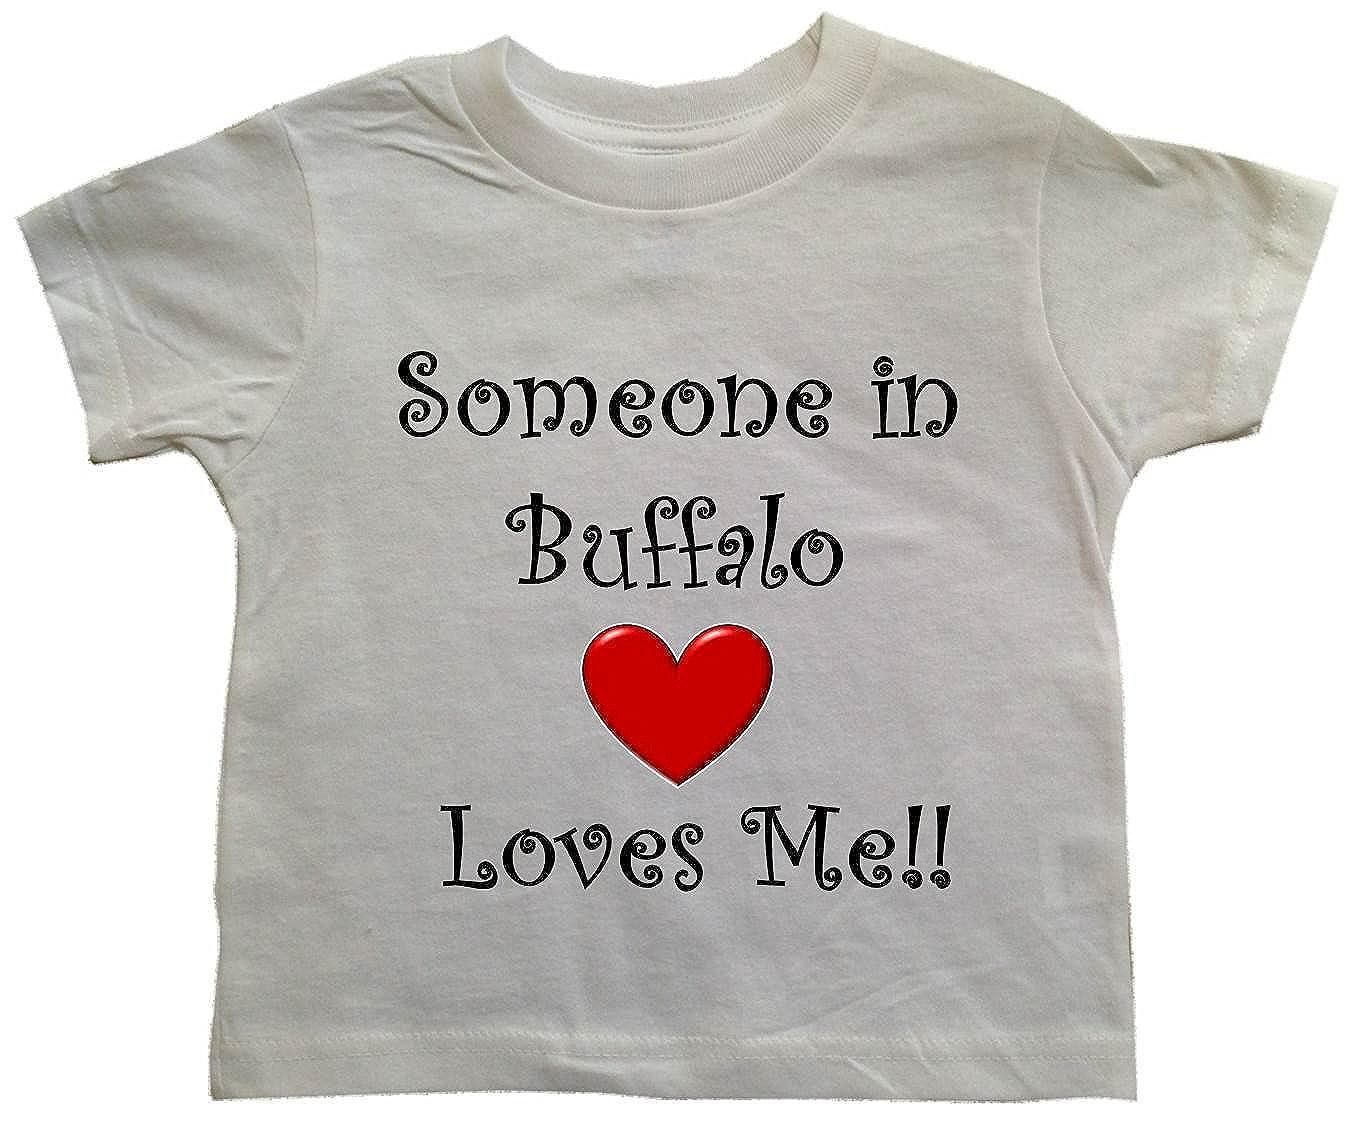 City-series BUFFALO TODDLER White Toddler T-shirt SOMEONE IN BUFFALO LOVES ME